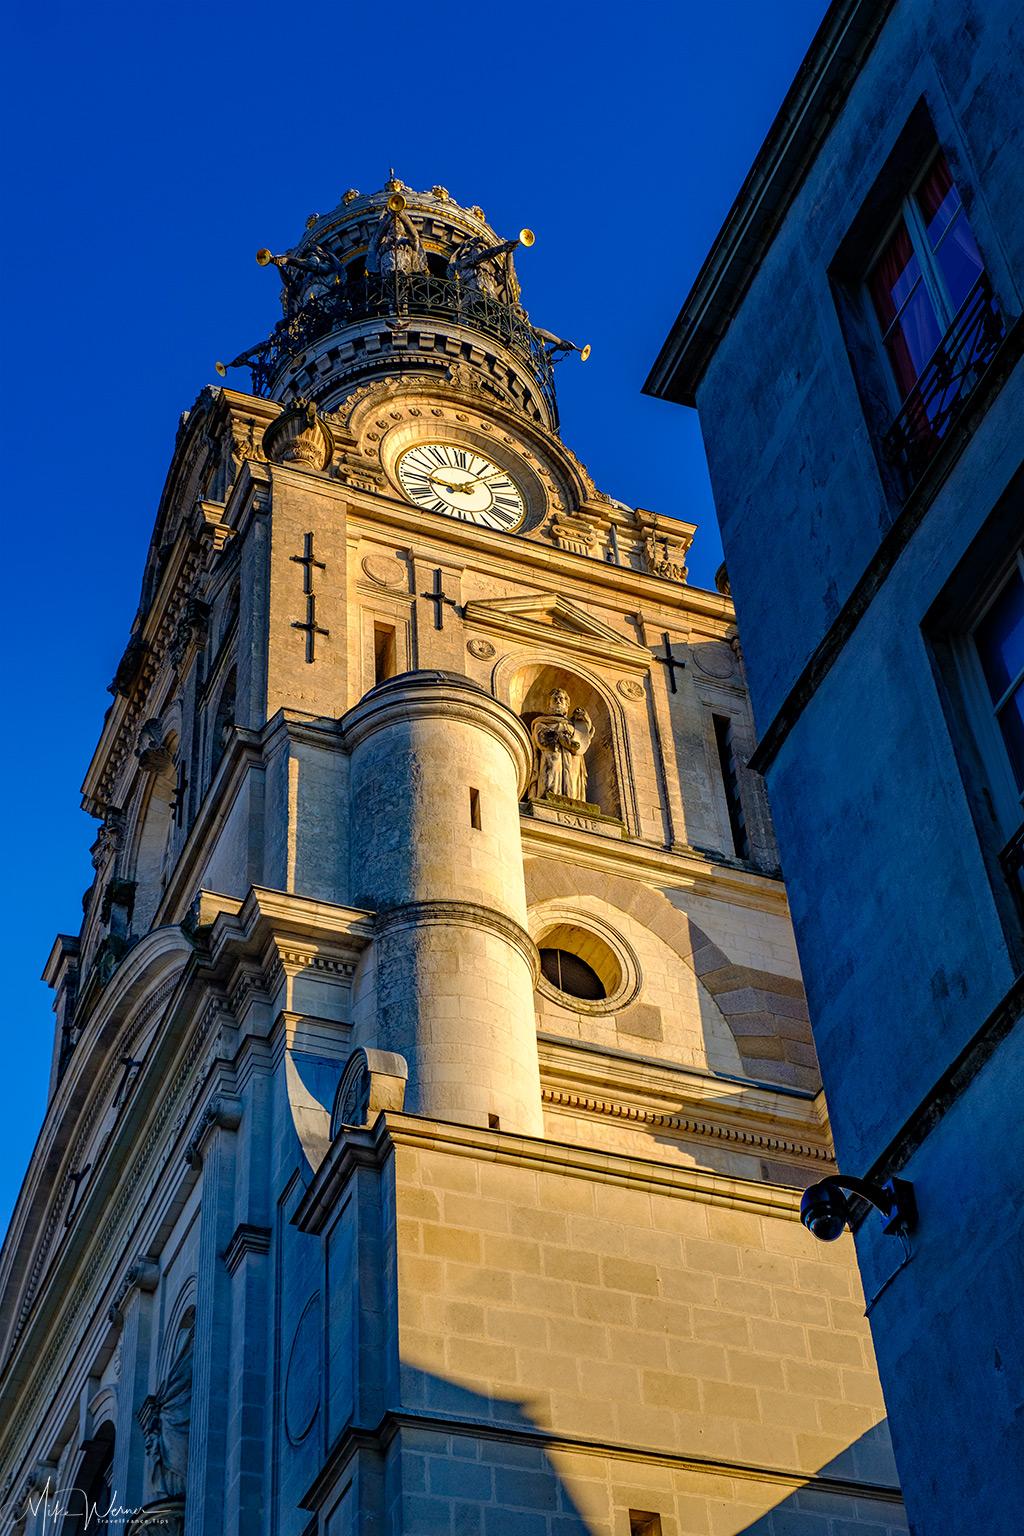 The belltower of the Sainte-Croix church in Nantes